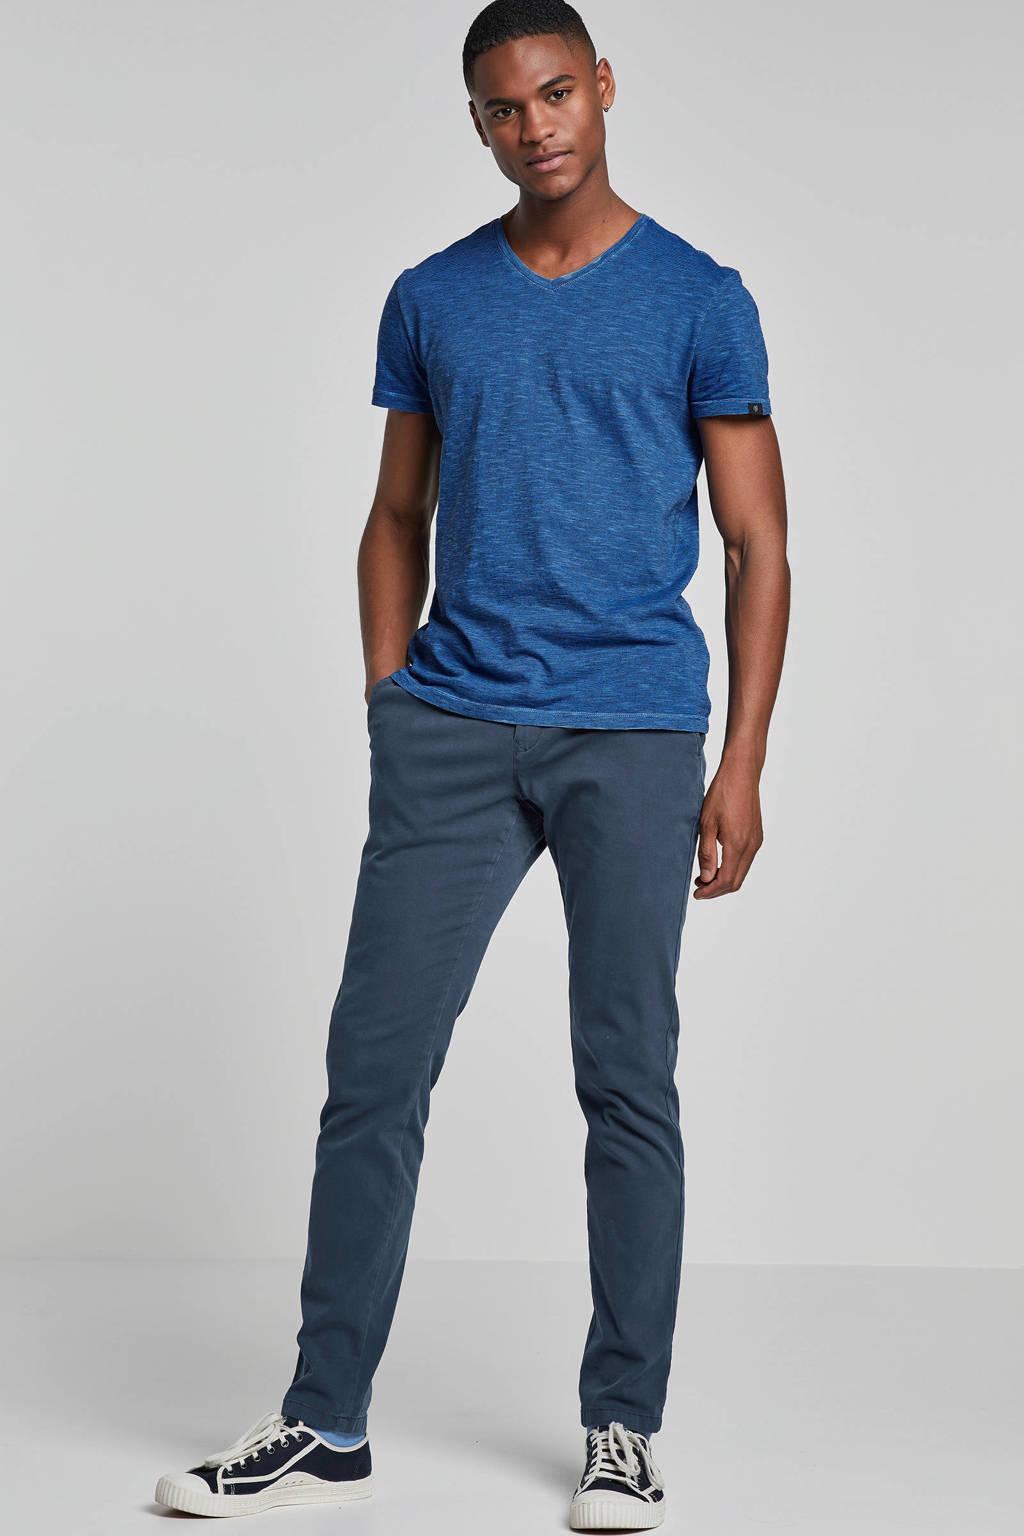 Marc O'Polo gestreept T-shirt blauw, Blauw/zwart